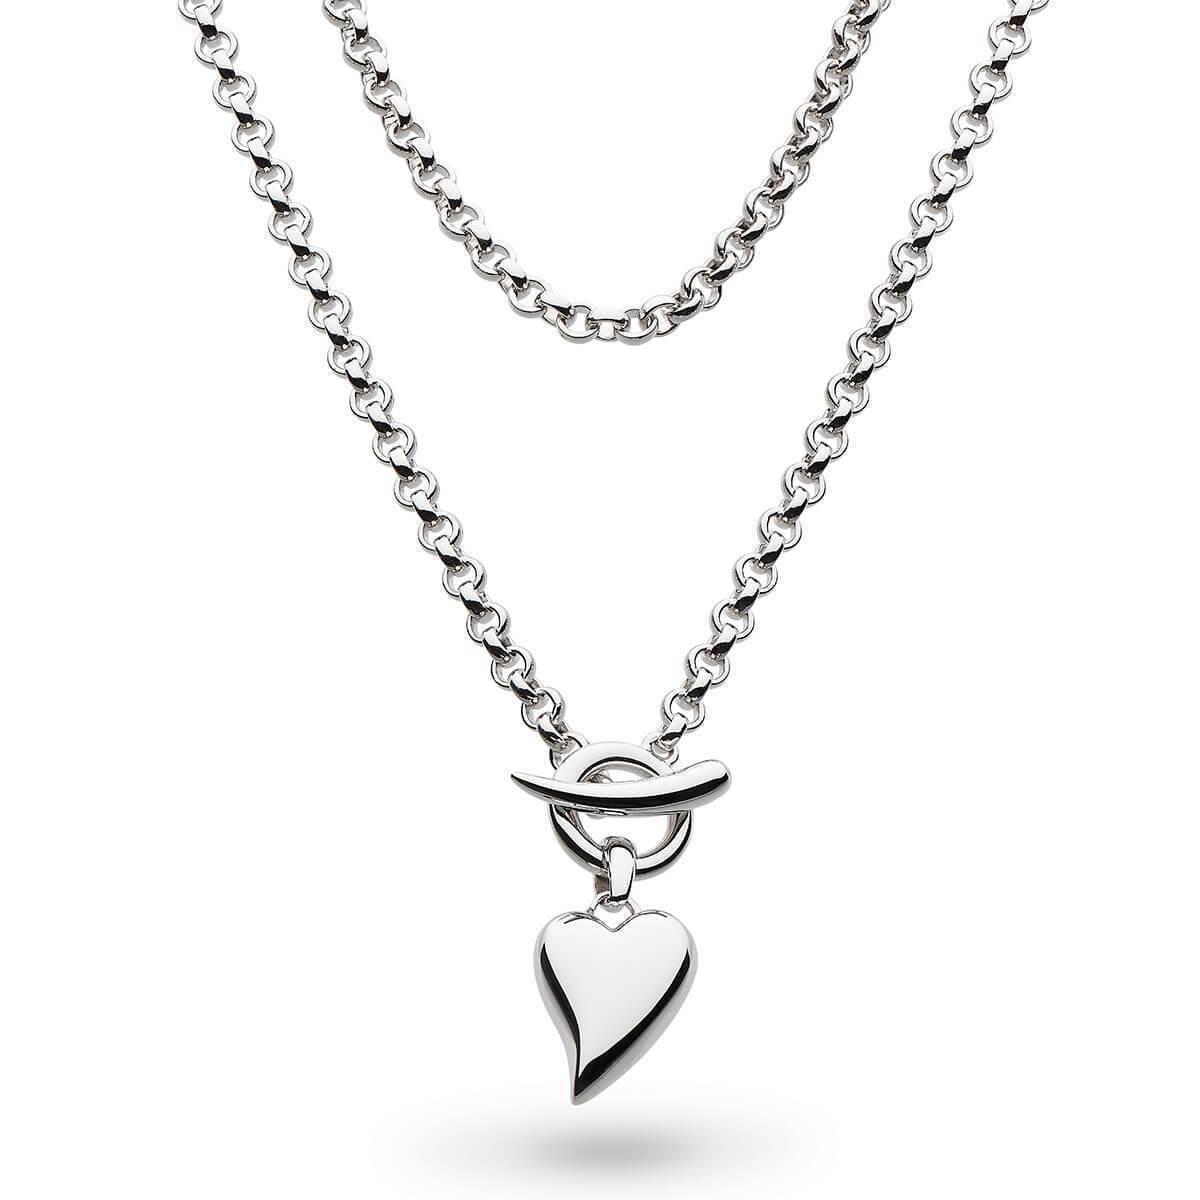 Kit Heath Desire Forever Lust Heart Lariat Necklace 7L4mzI